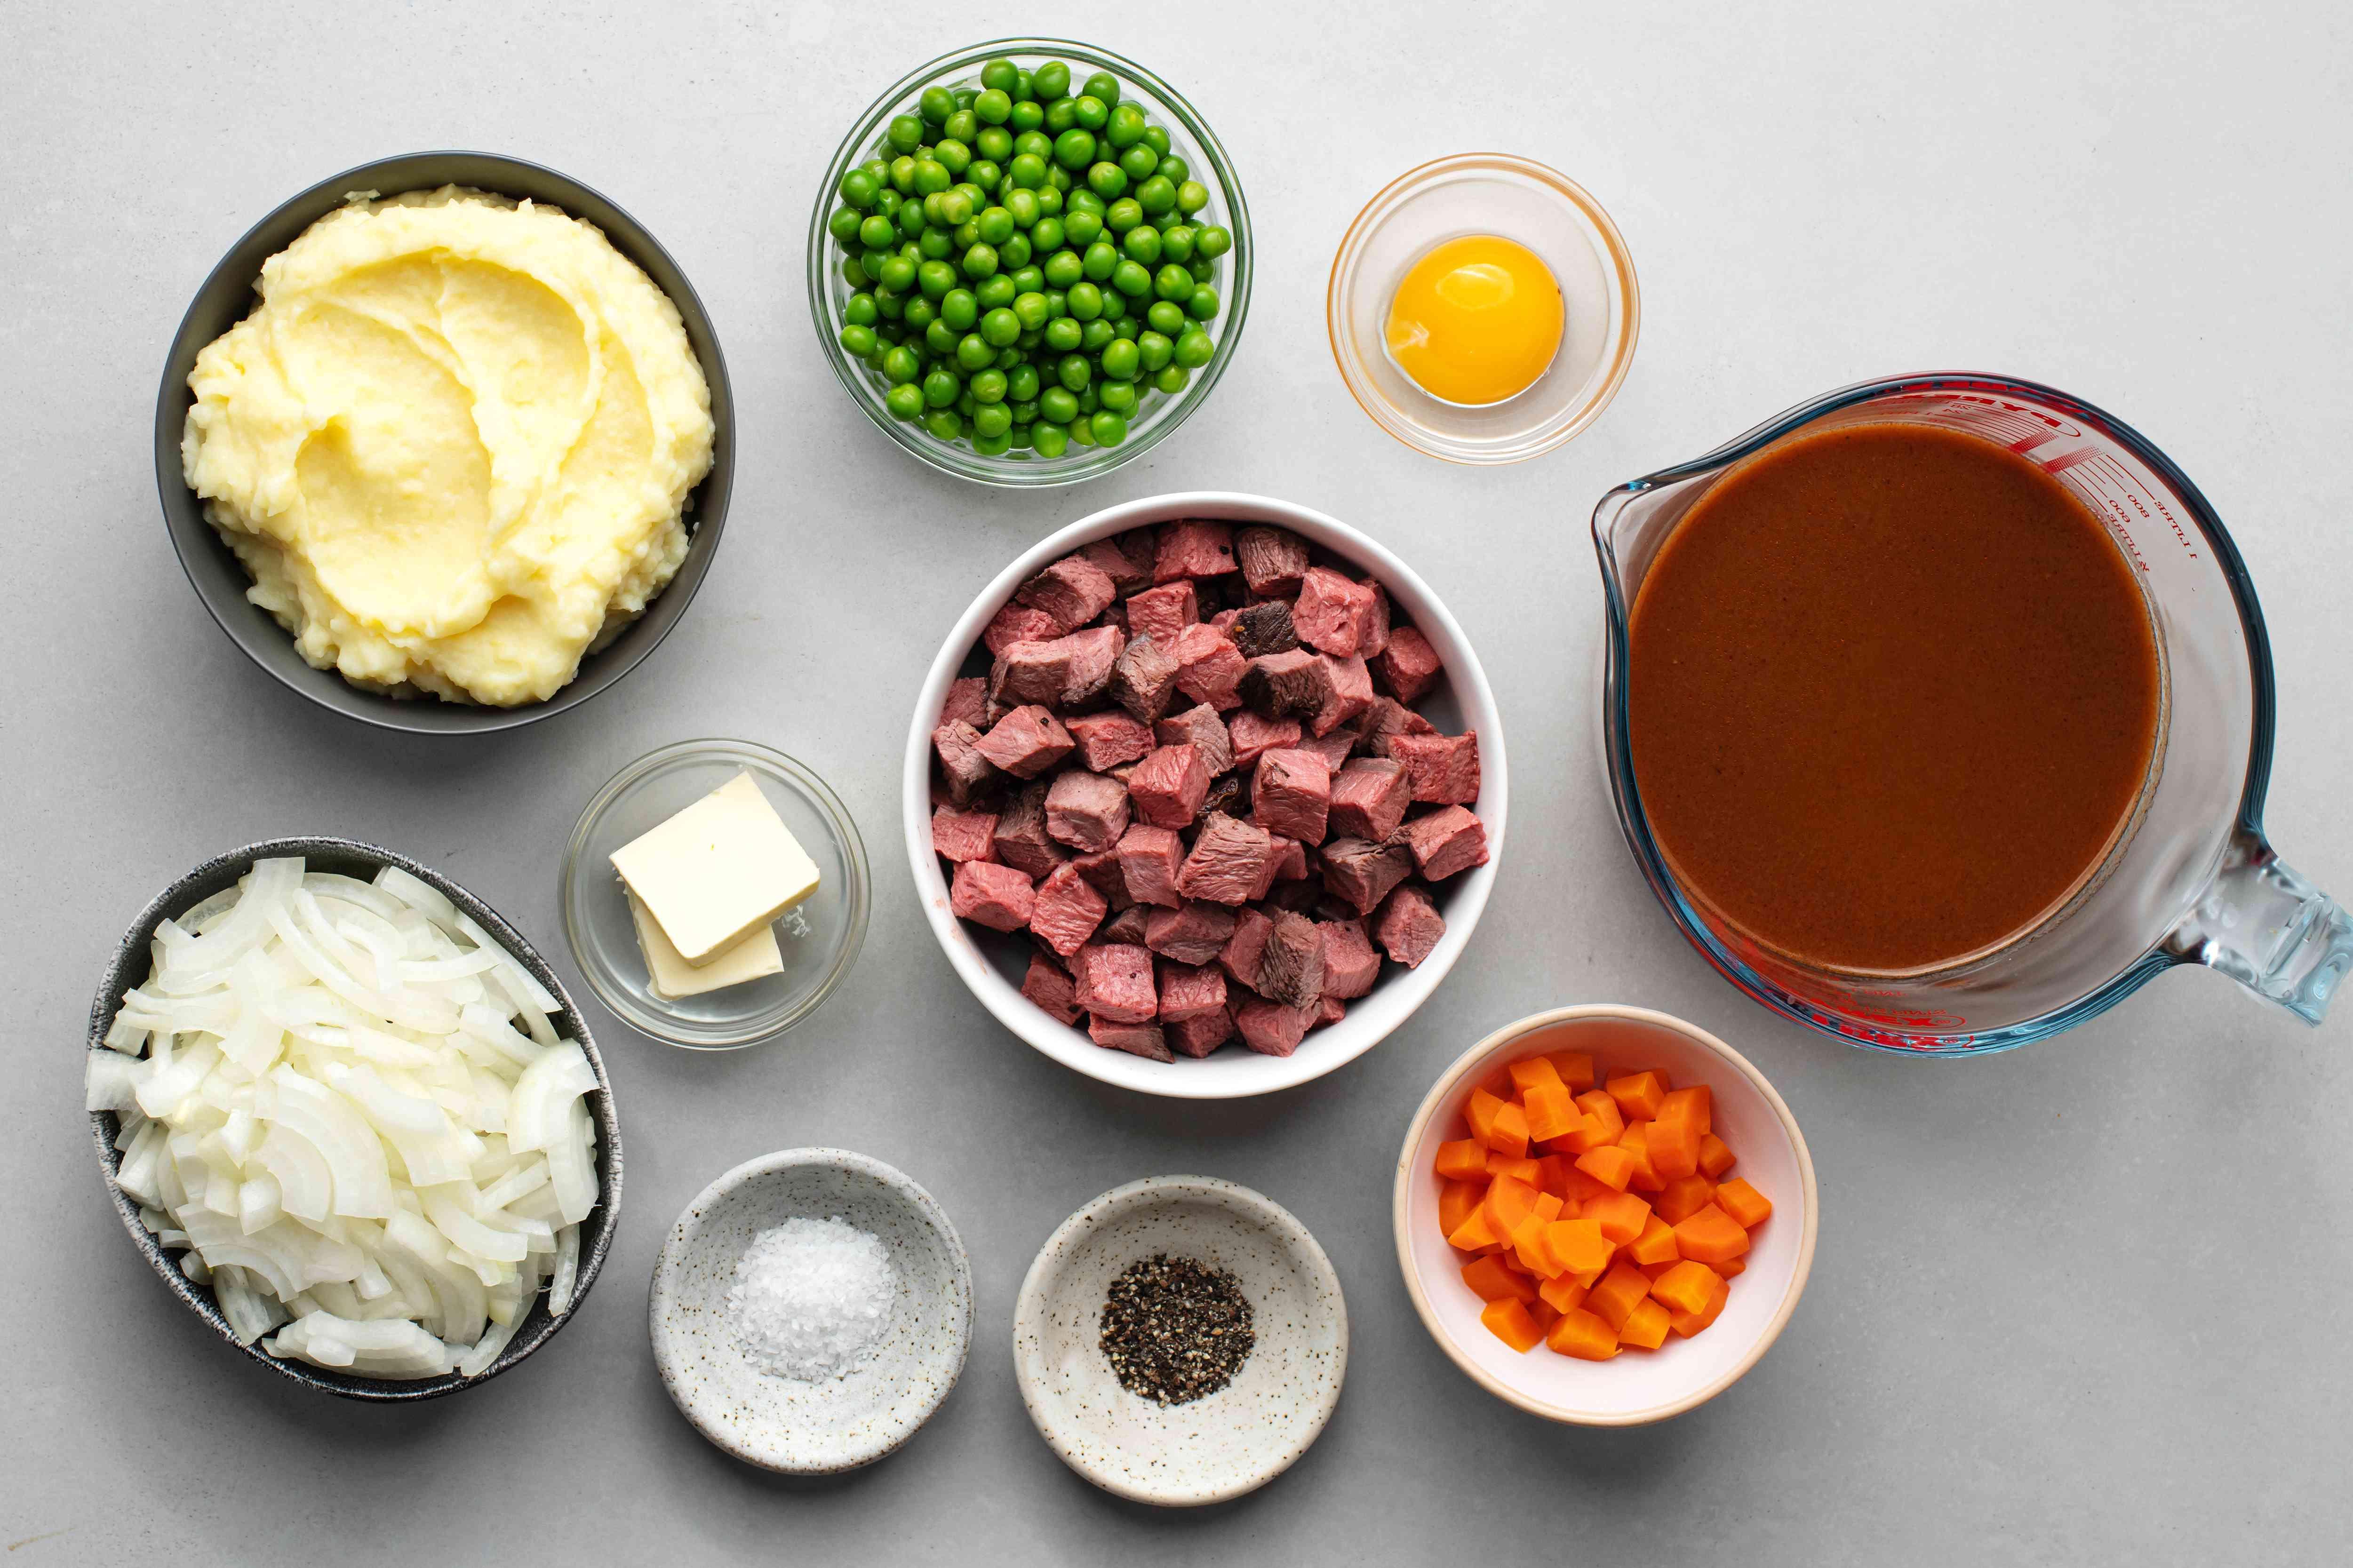 Shepherd's pie recipe with beef or lamb ingredients